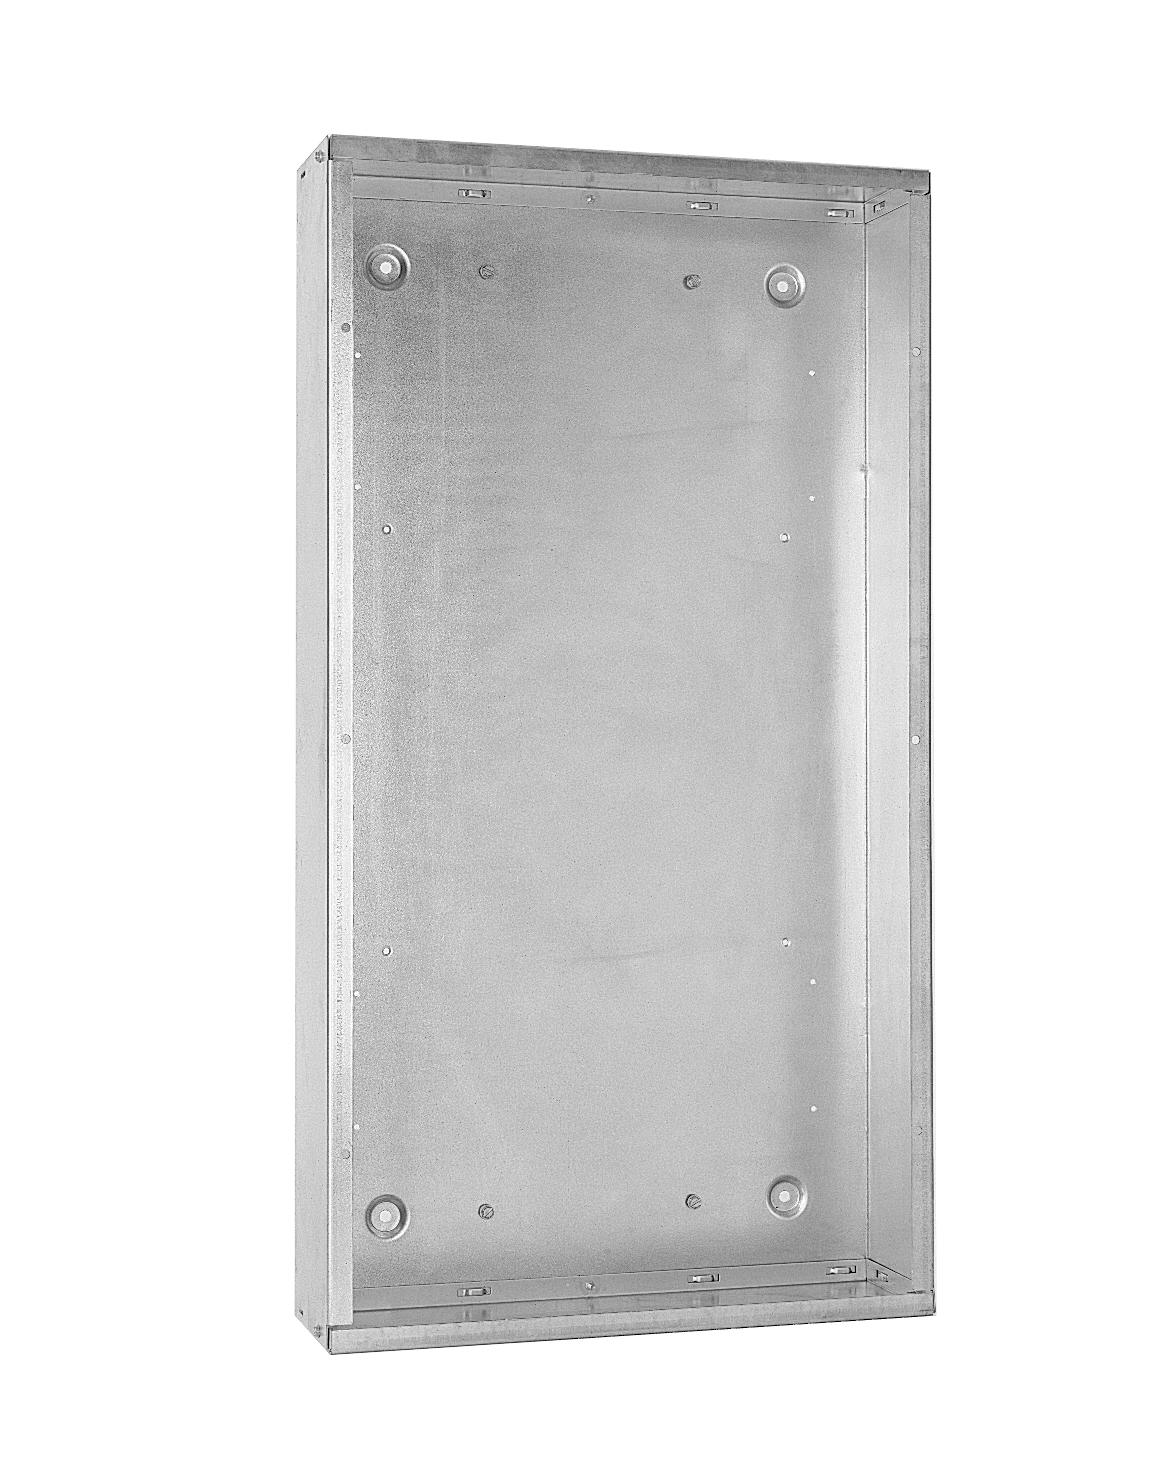 GE,AB76B,General Electric AB76B Panel Board Box, Enclosure: NEMA 1, Size: 76.500 IN Height X 20.000 IN Width X 5.810 IN Depth, Consist of: Blank Endwall